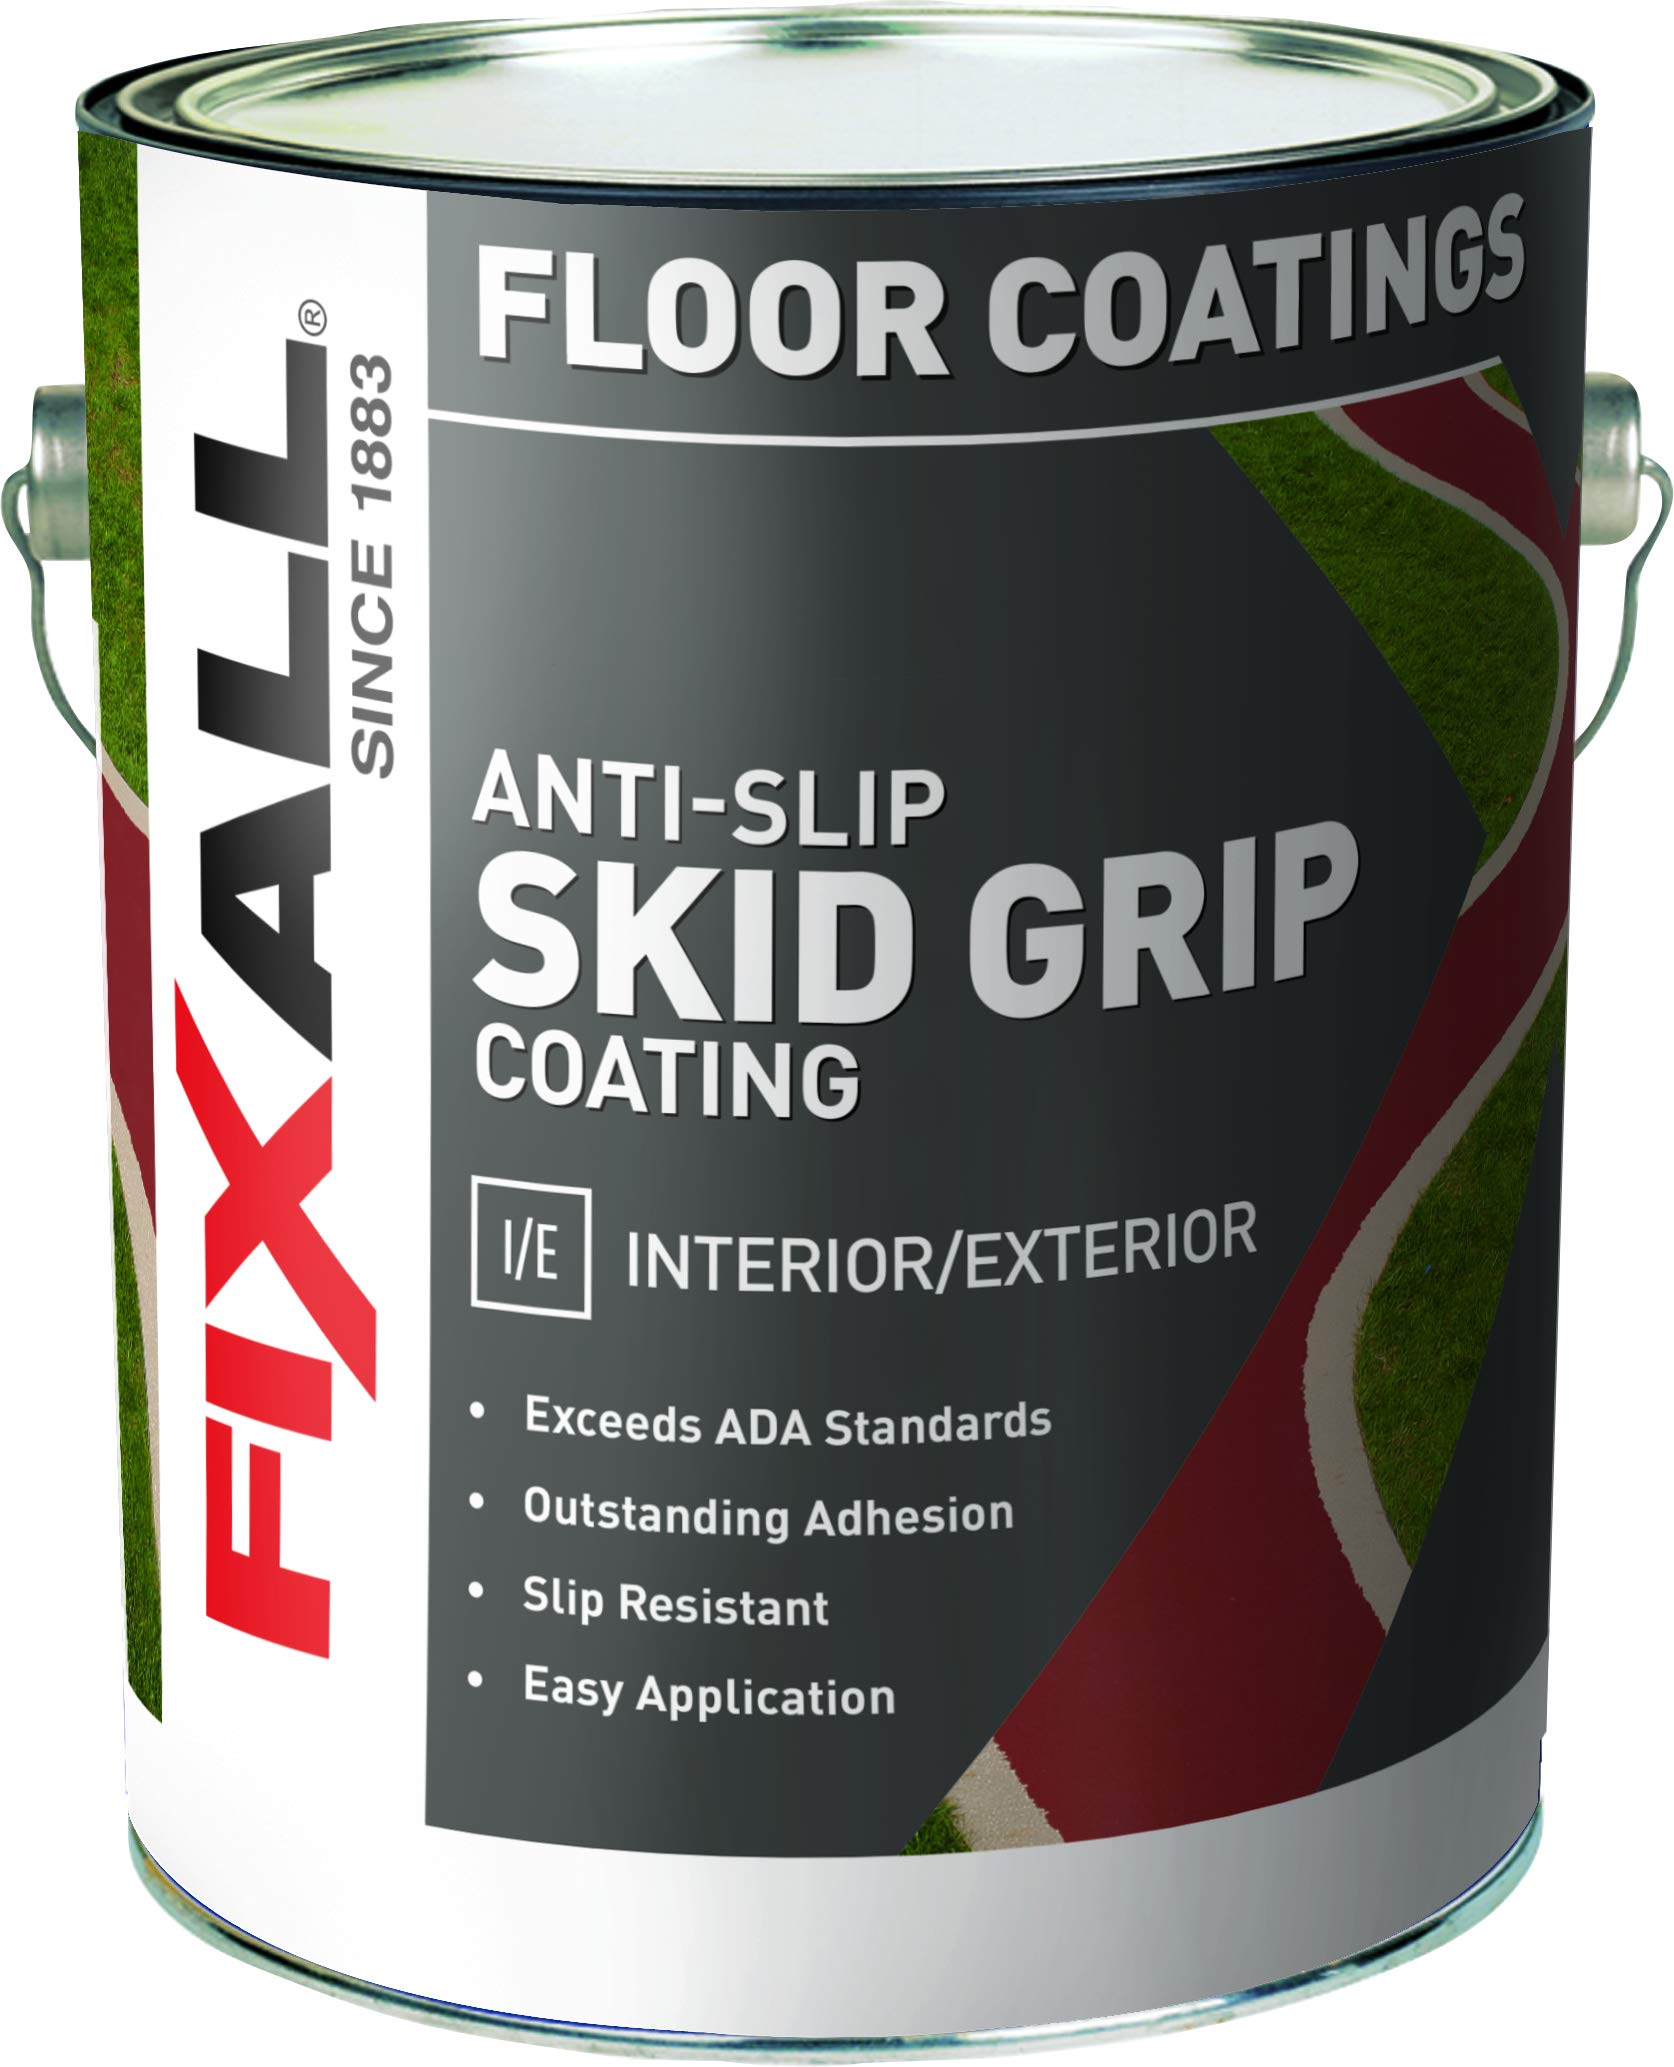 Skid Grip Anti-Slip Paint, 100% Acrylic Skid-Resistant Textured Coating (Emerald)